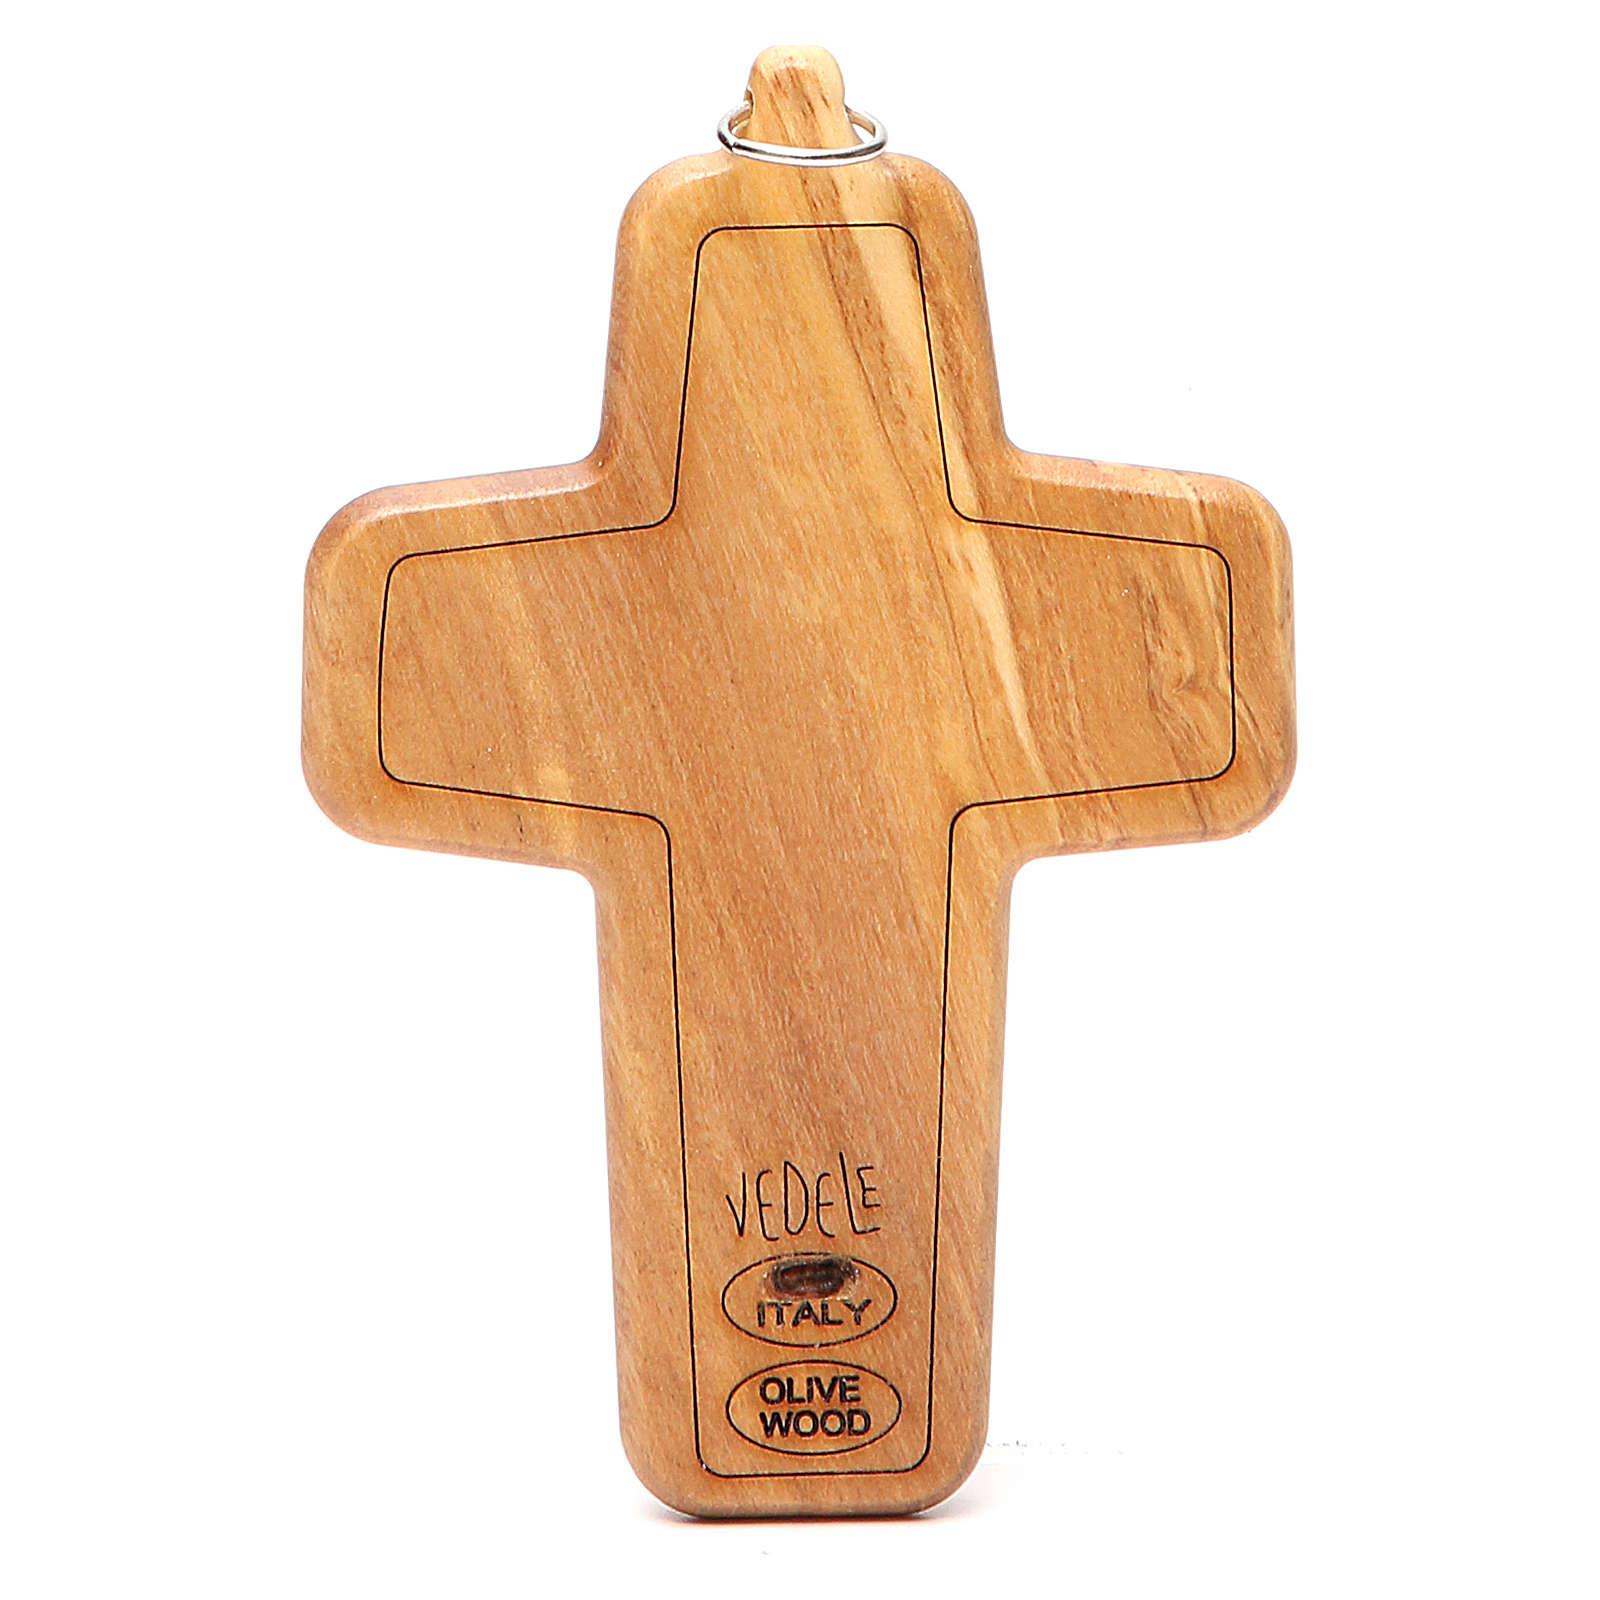 Cruz pectoral metal madera olivo 12 x 8,5 cm 3